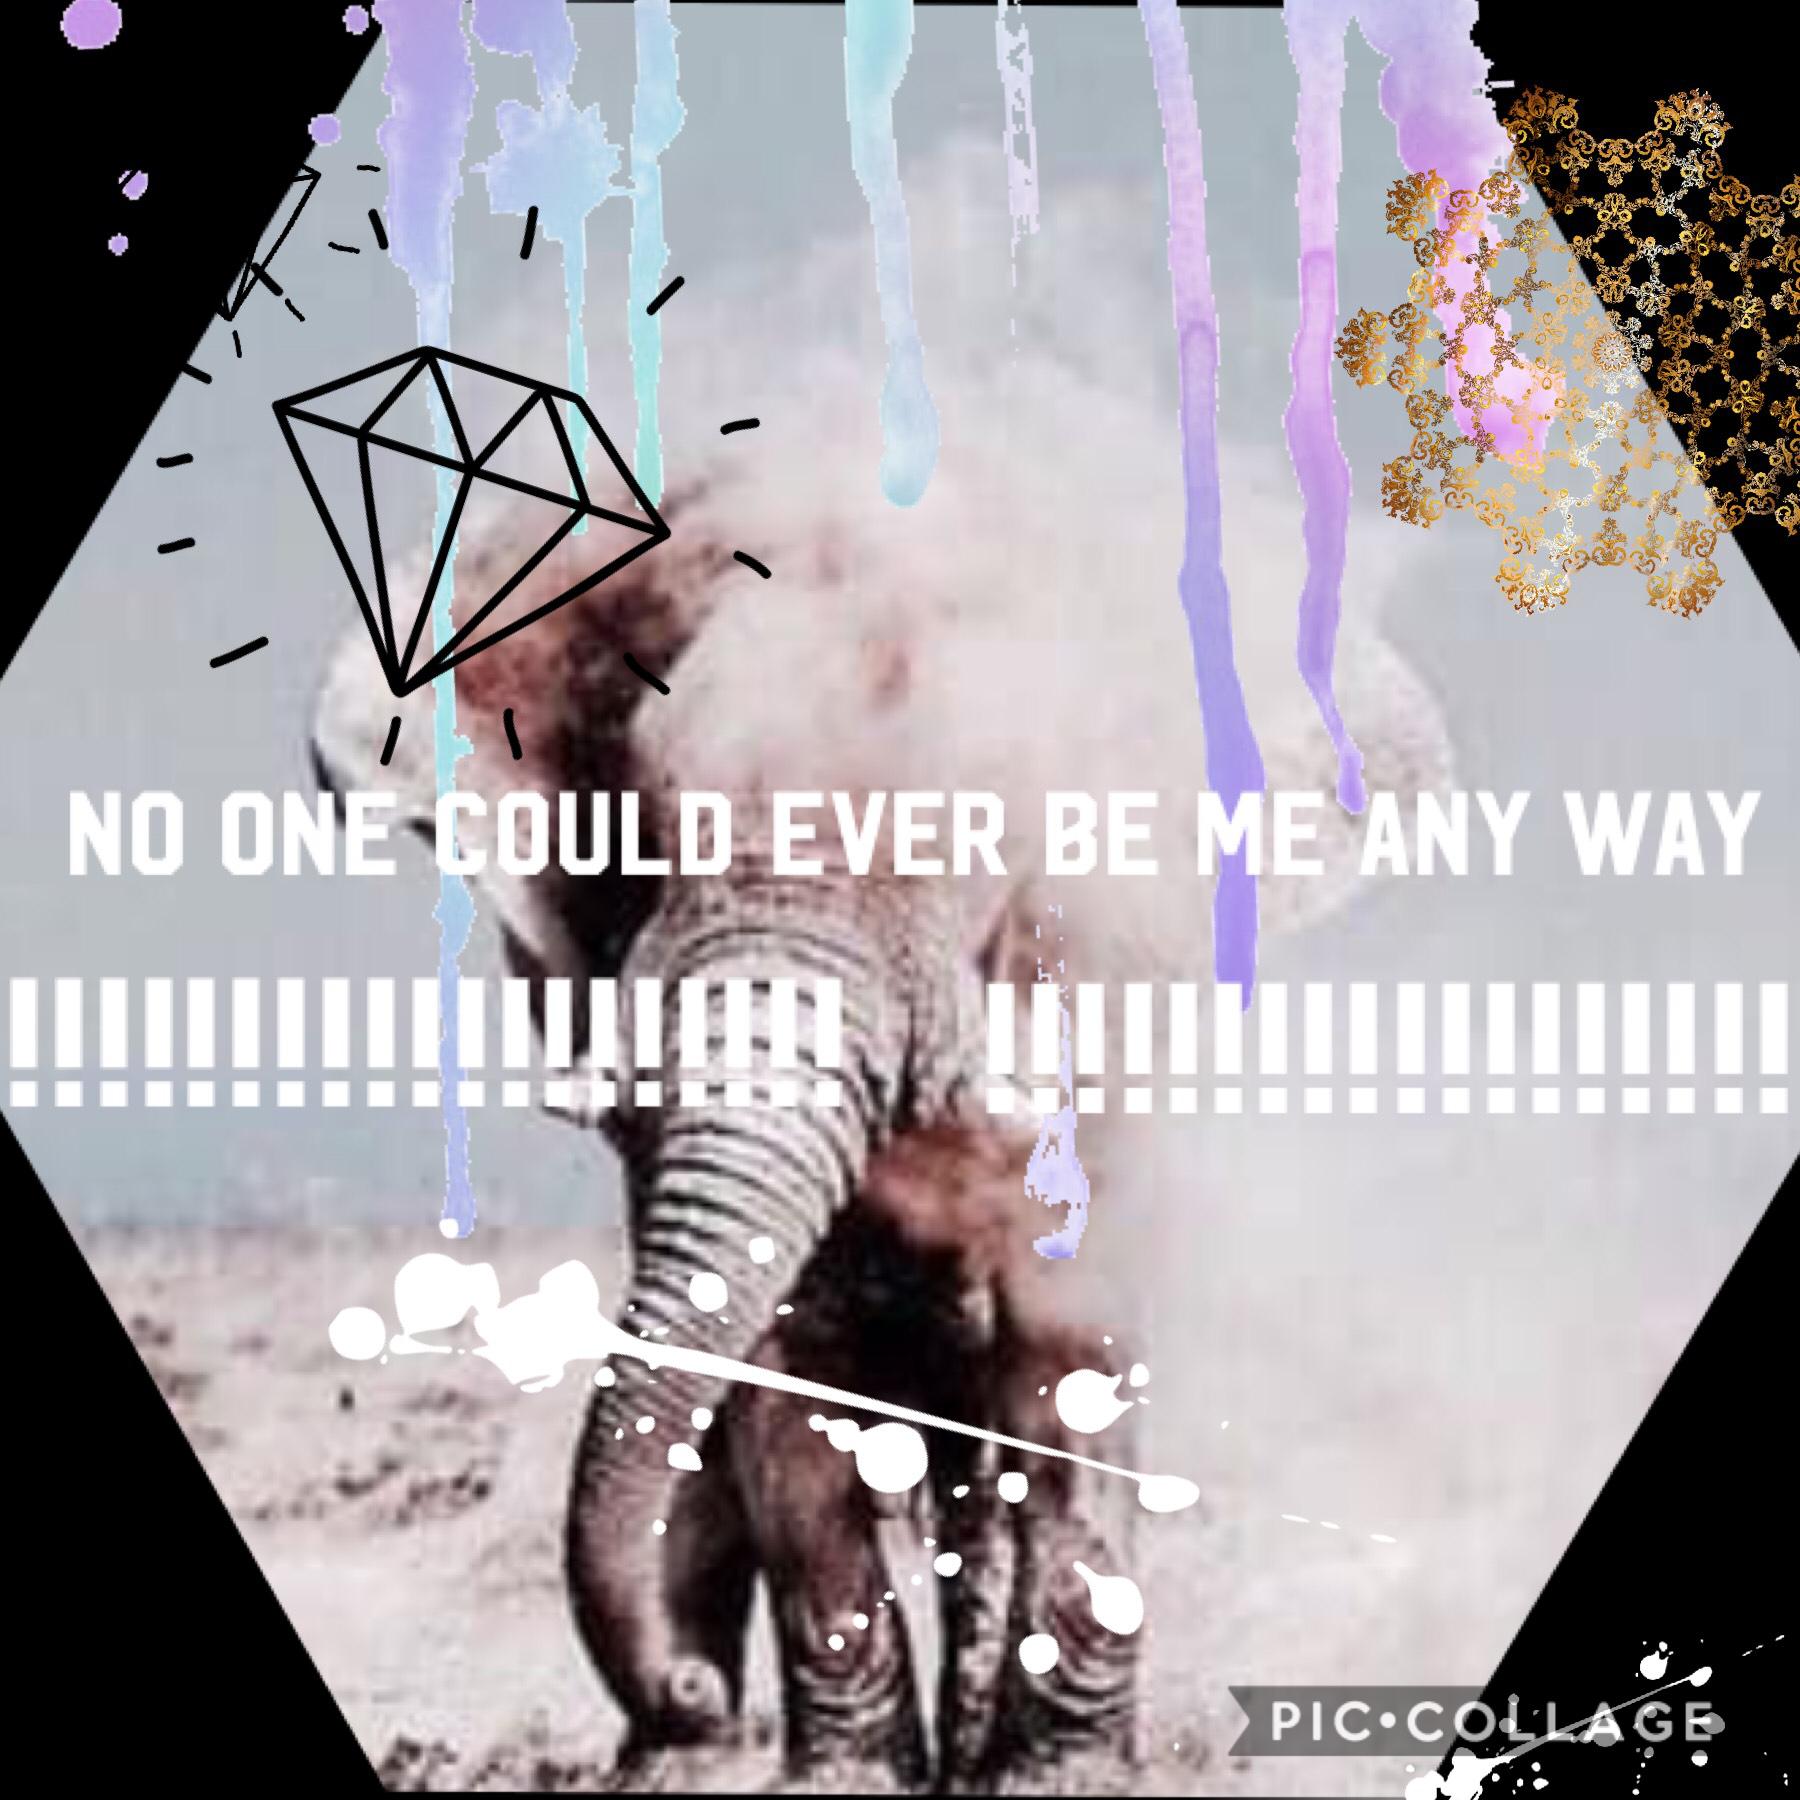 Collage by Conversegirl1885